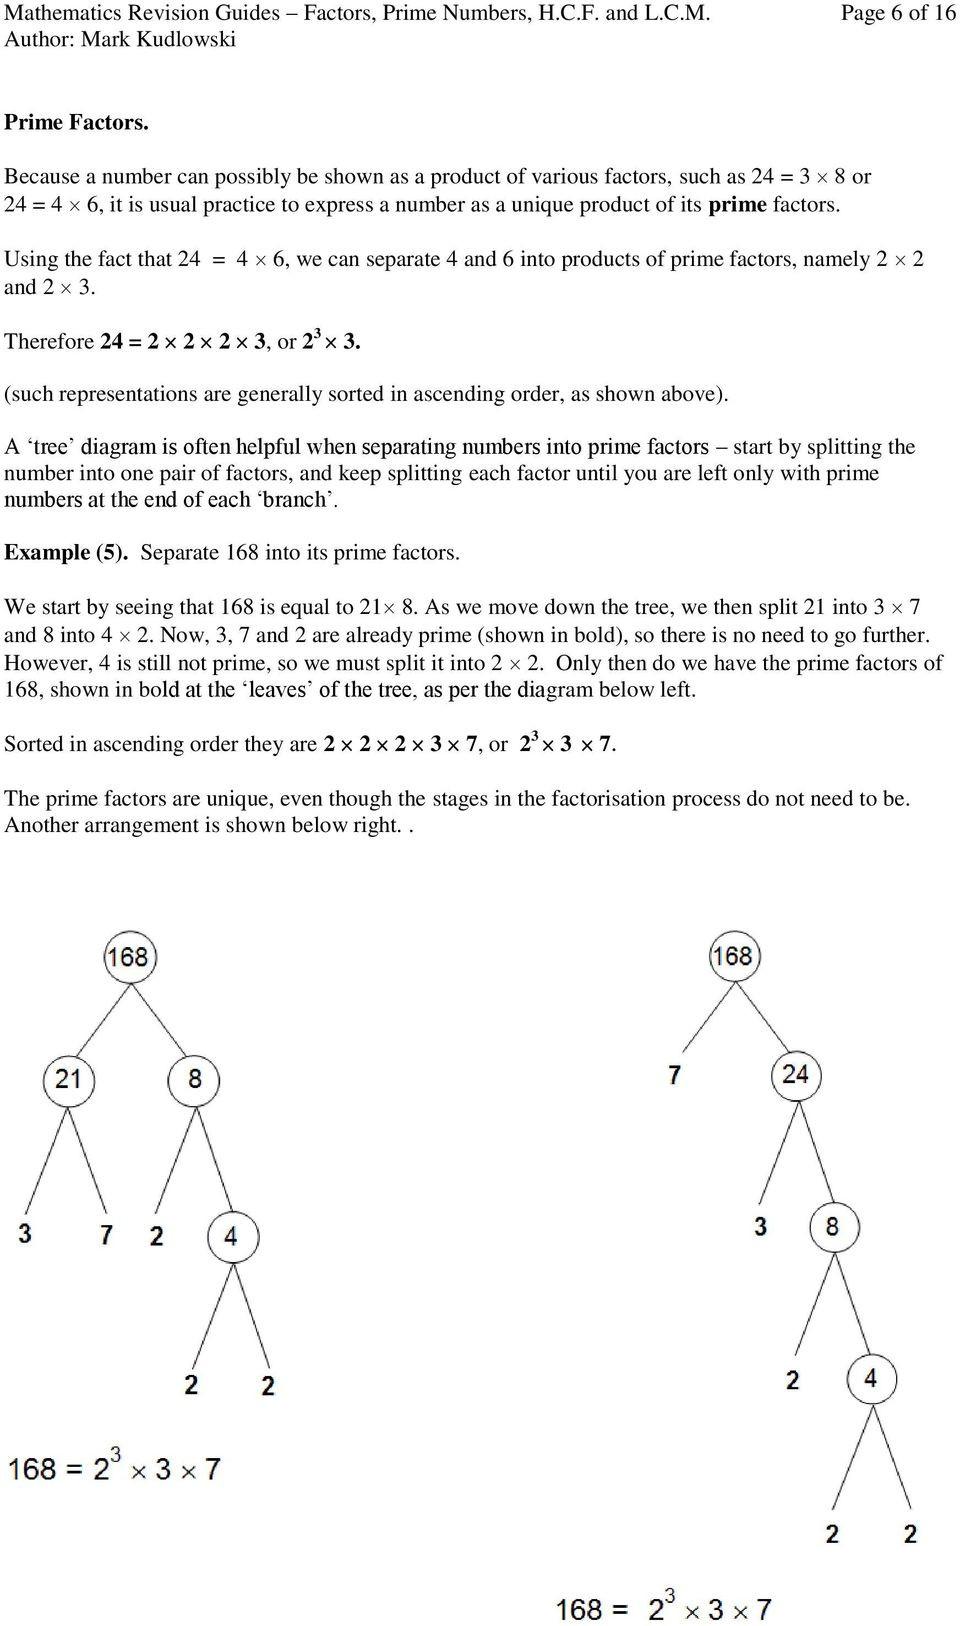 Prime Factorization Tree Worksheet Factors Prime Numbers H C F and L C M Pdf Free Download